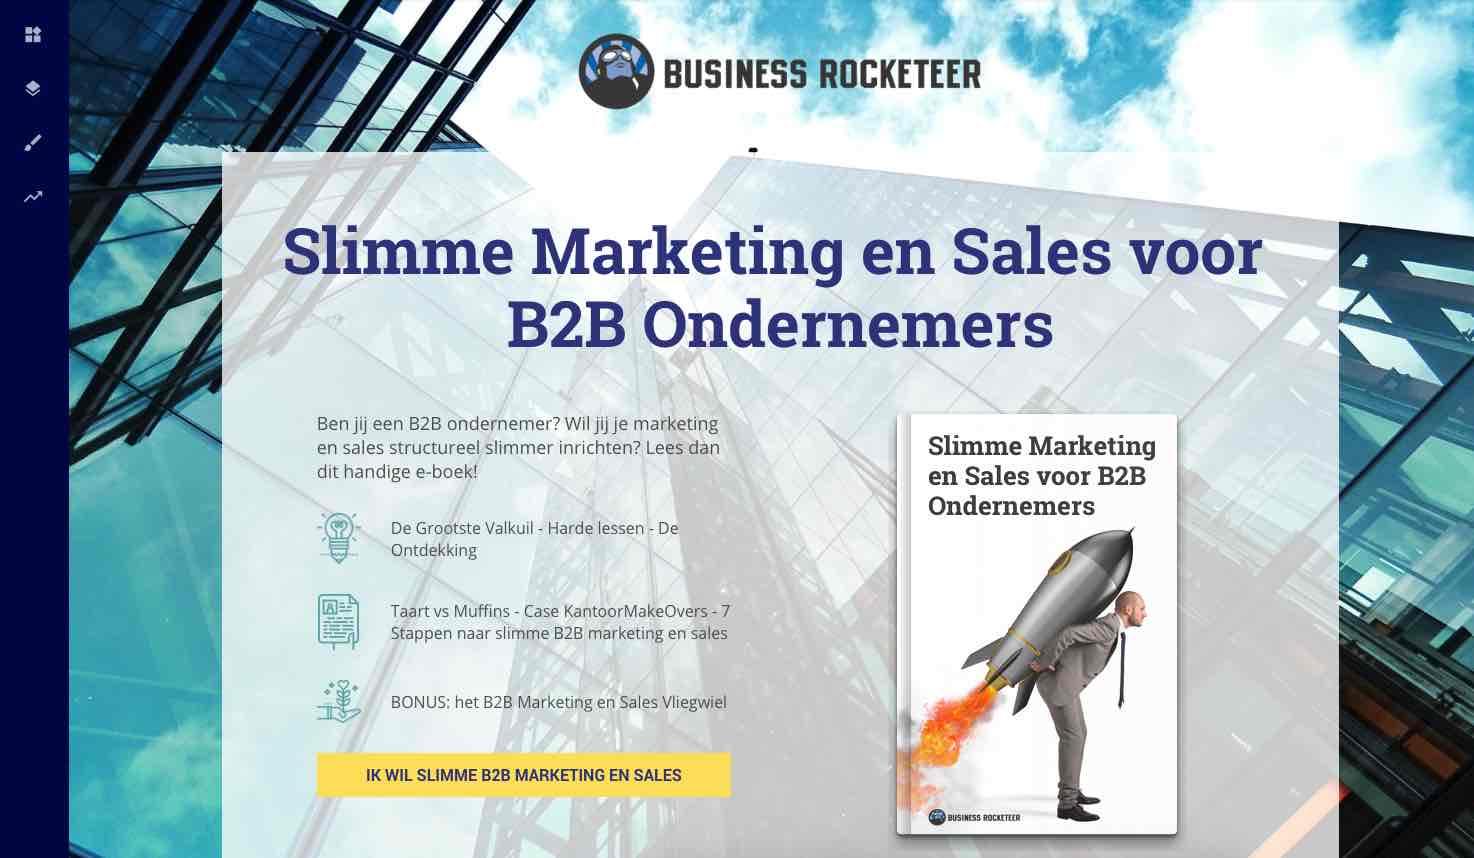 leadpages landingspagina business rocketeer